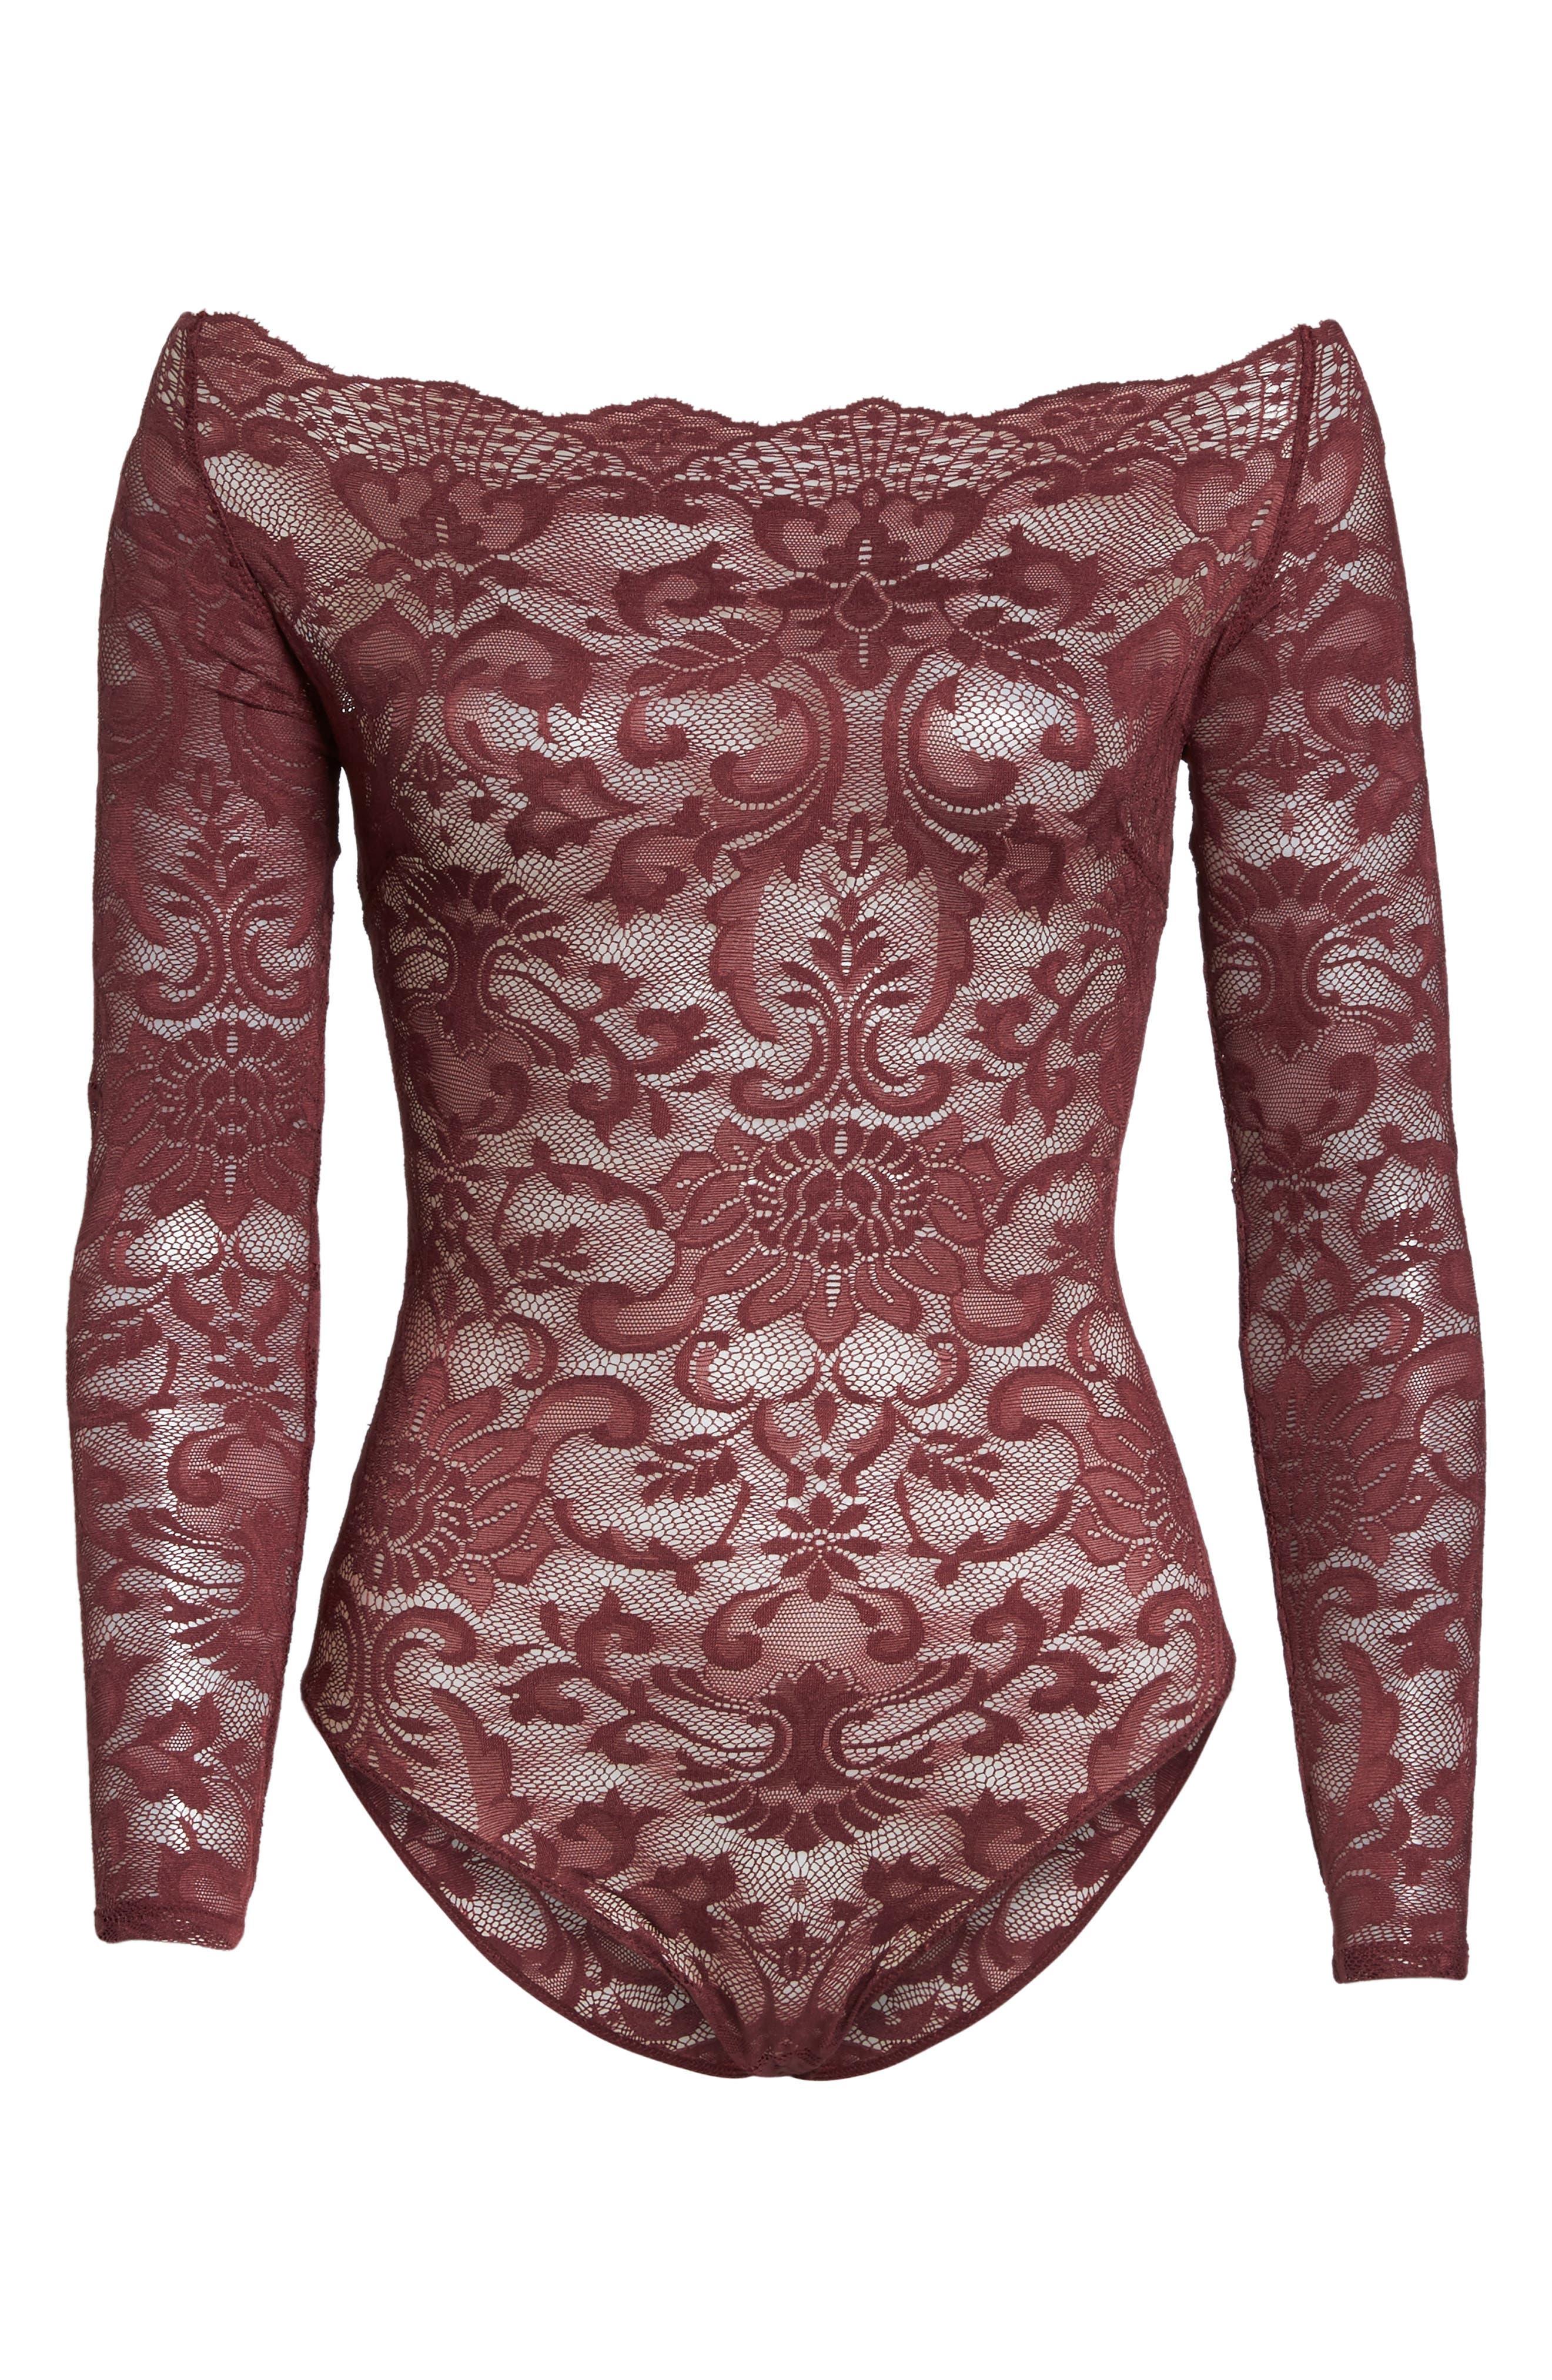 Eliza Off the Shoulder Lace Bodysuit,                             Alternate thumbnail 4, color,                             Tawny Port